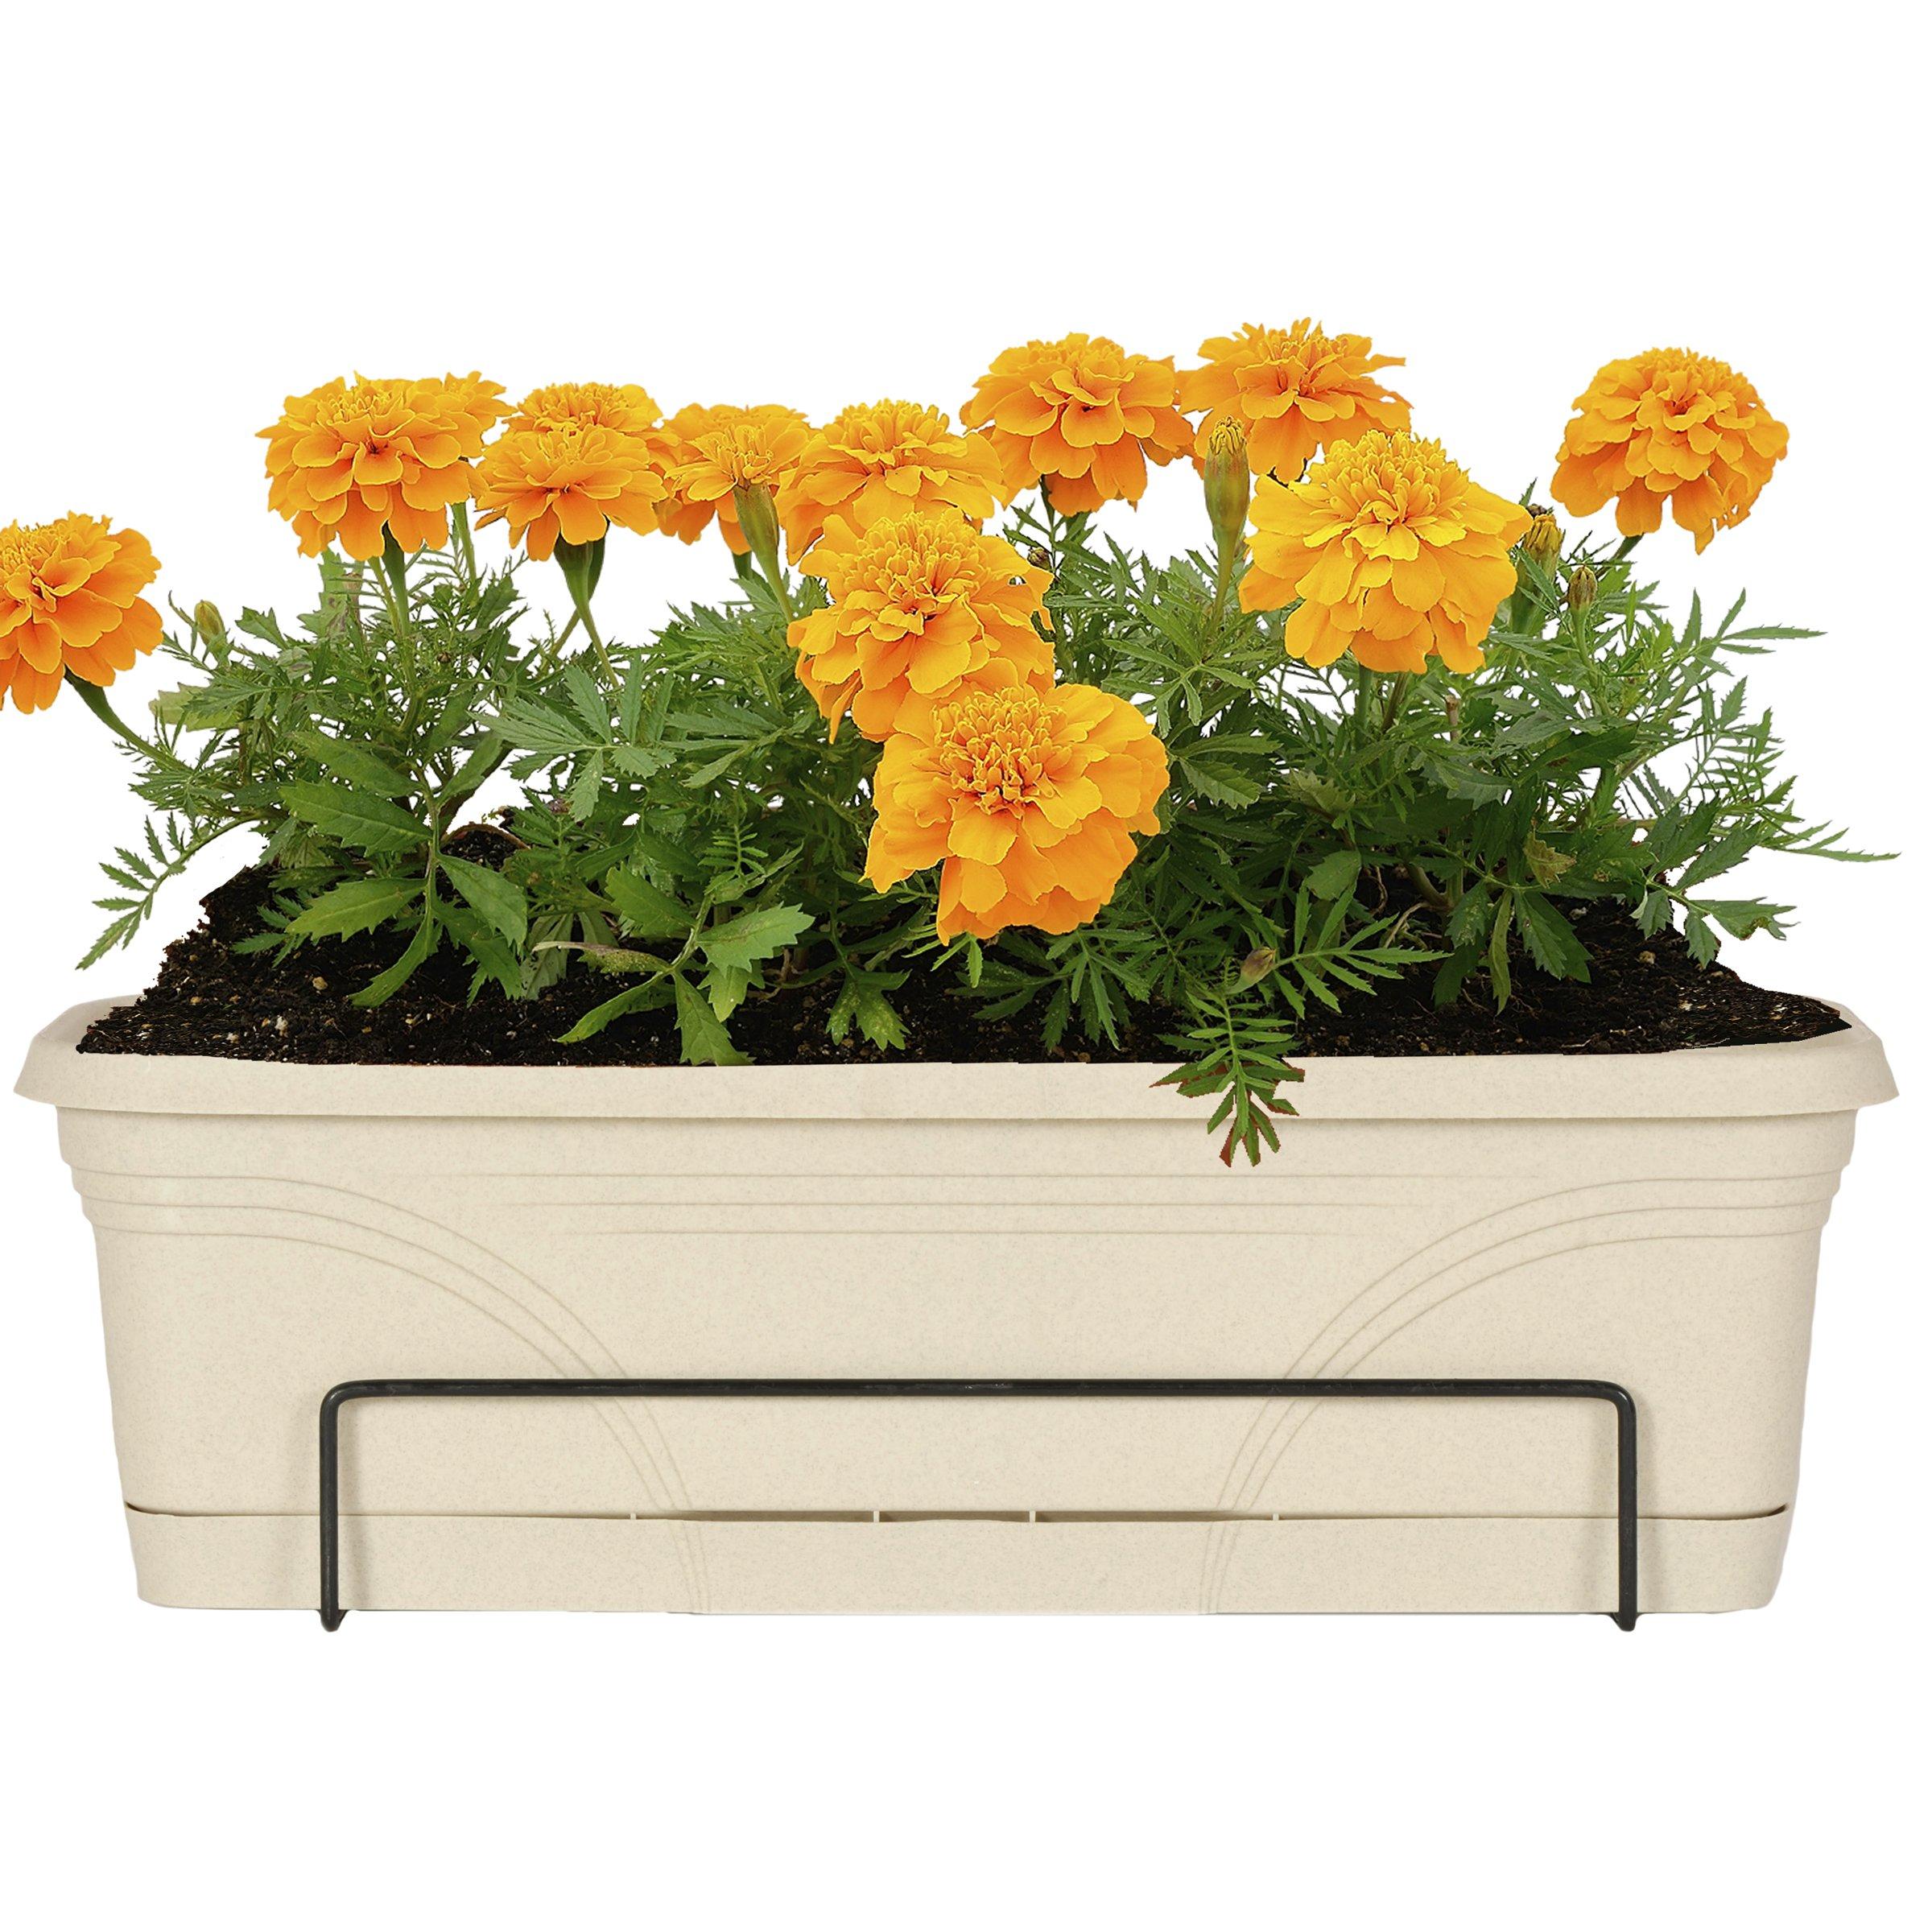 CobraCo 18-Inch to 36-Inch Black Adjustable Open-End Flower Box Holder FOE26-B